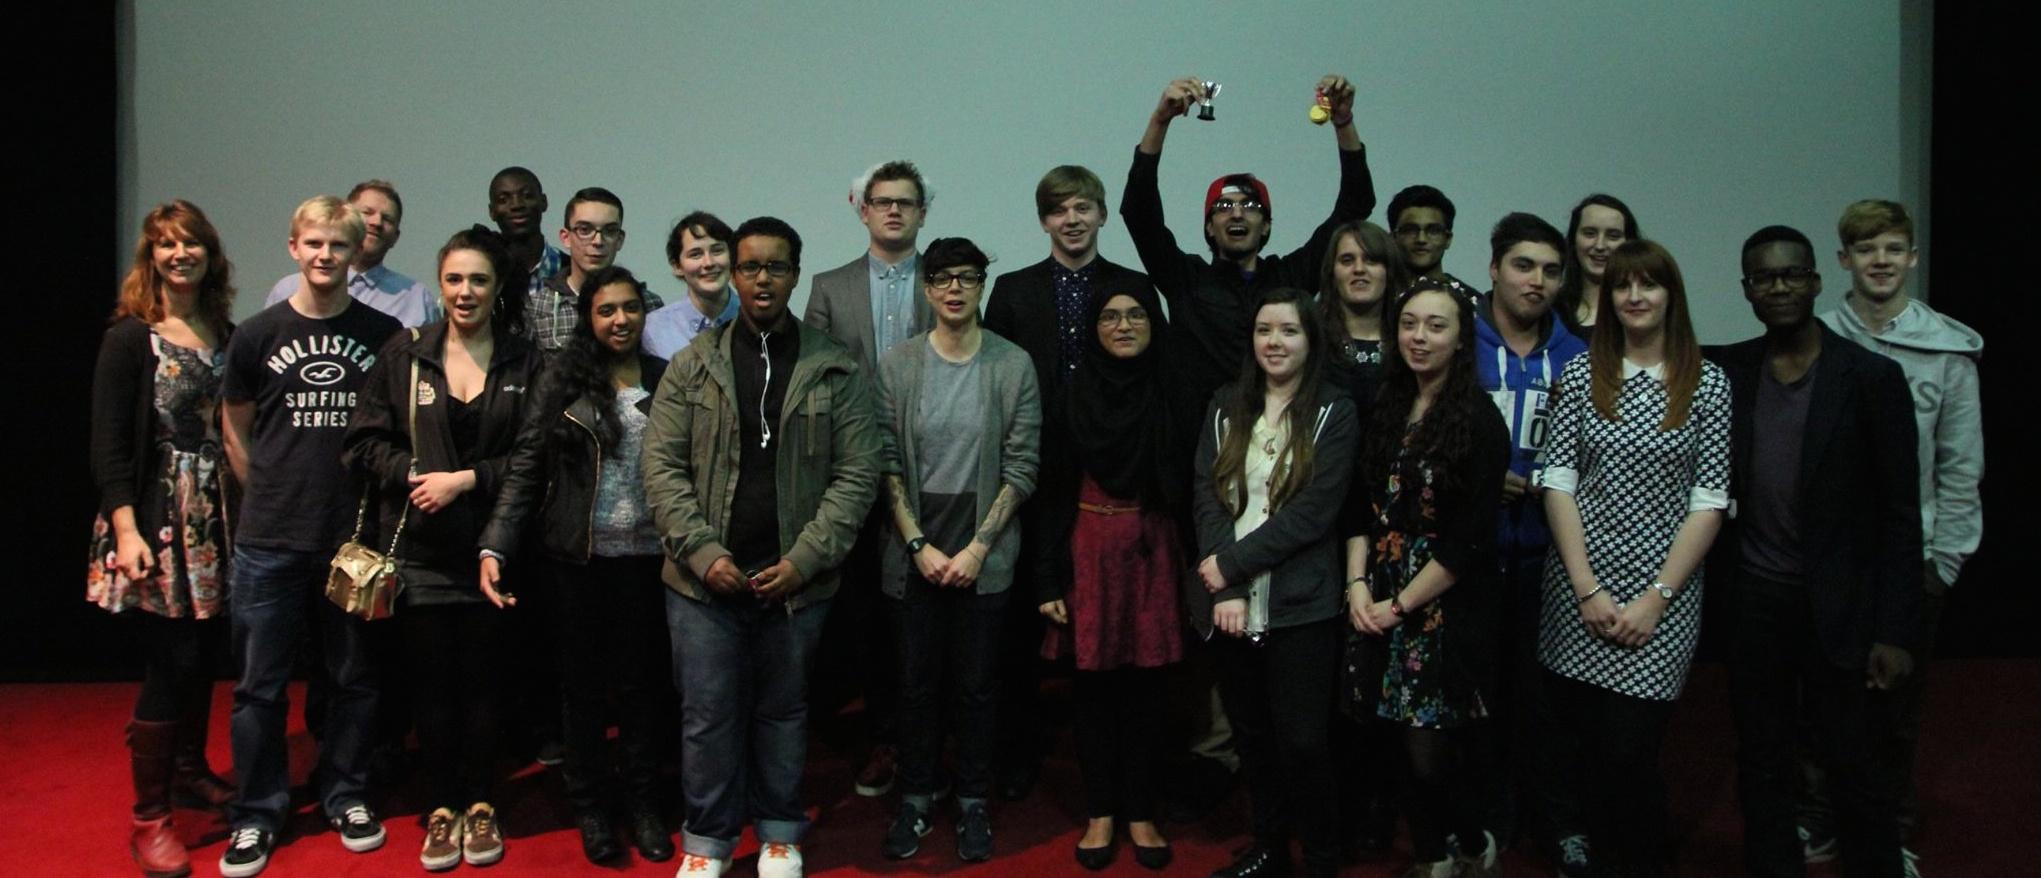 BFI students at Film Premier